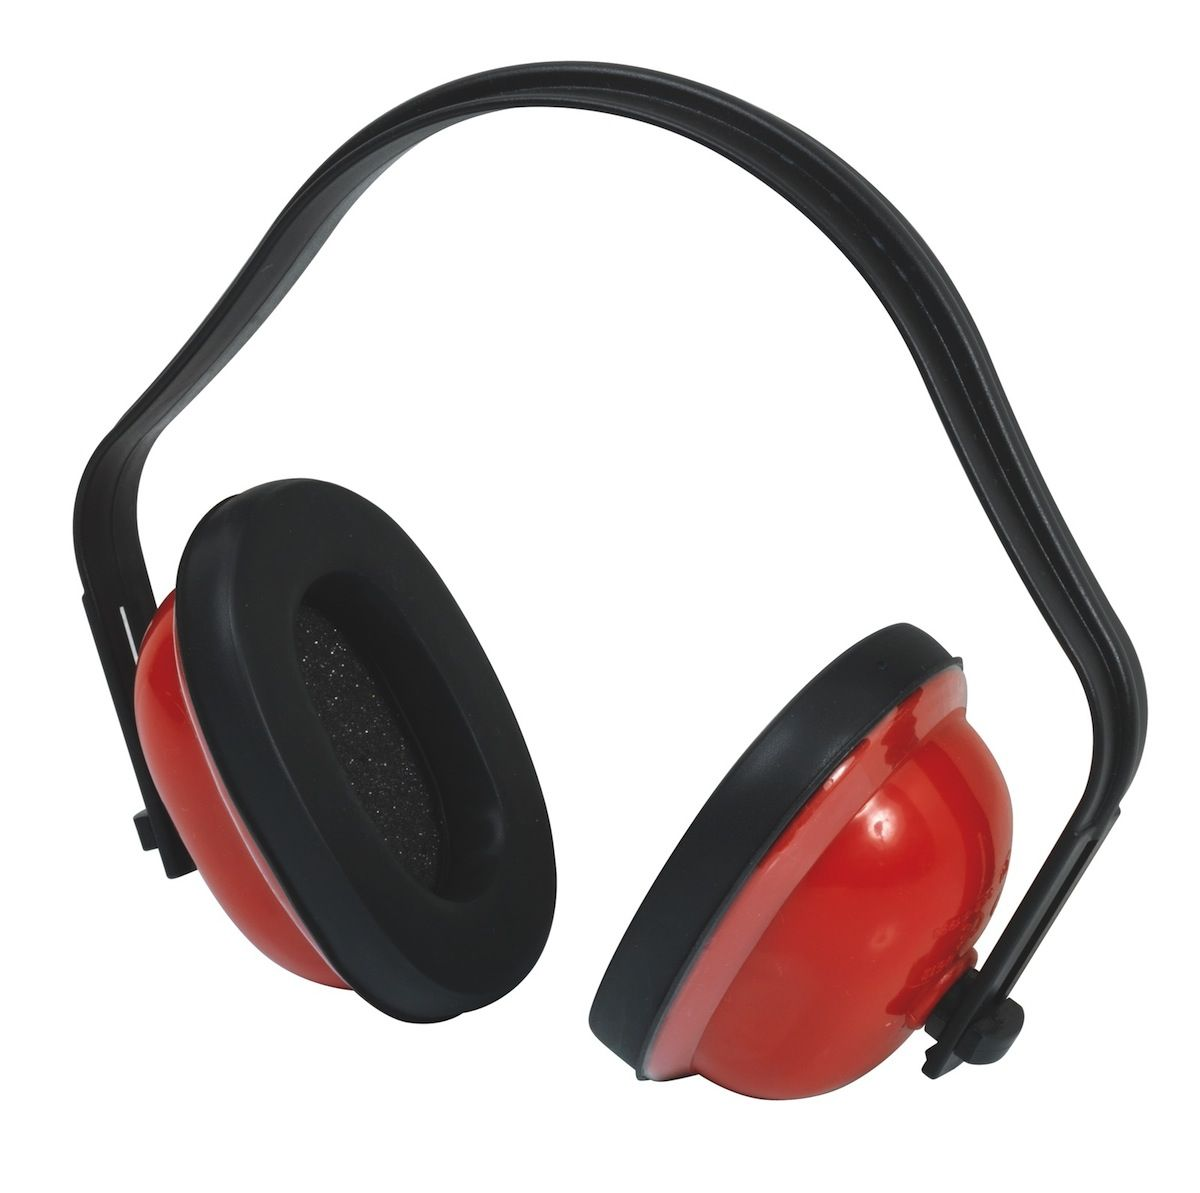 lot casque oreillette anti bruit lunettes securite ebay. Black Bedroom Furniture Sets. Home Design Ideas